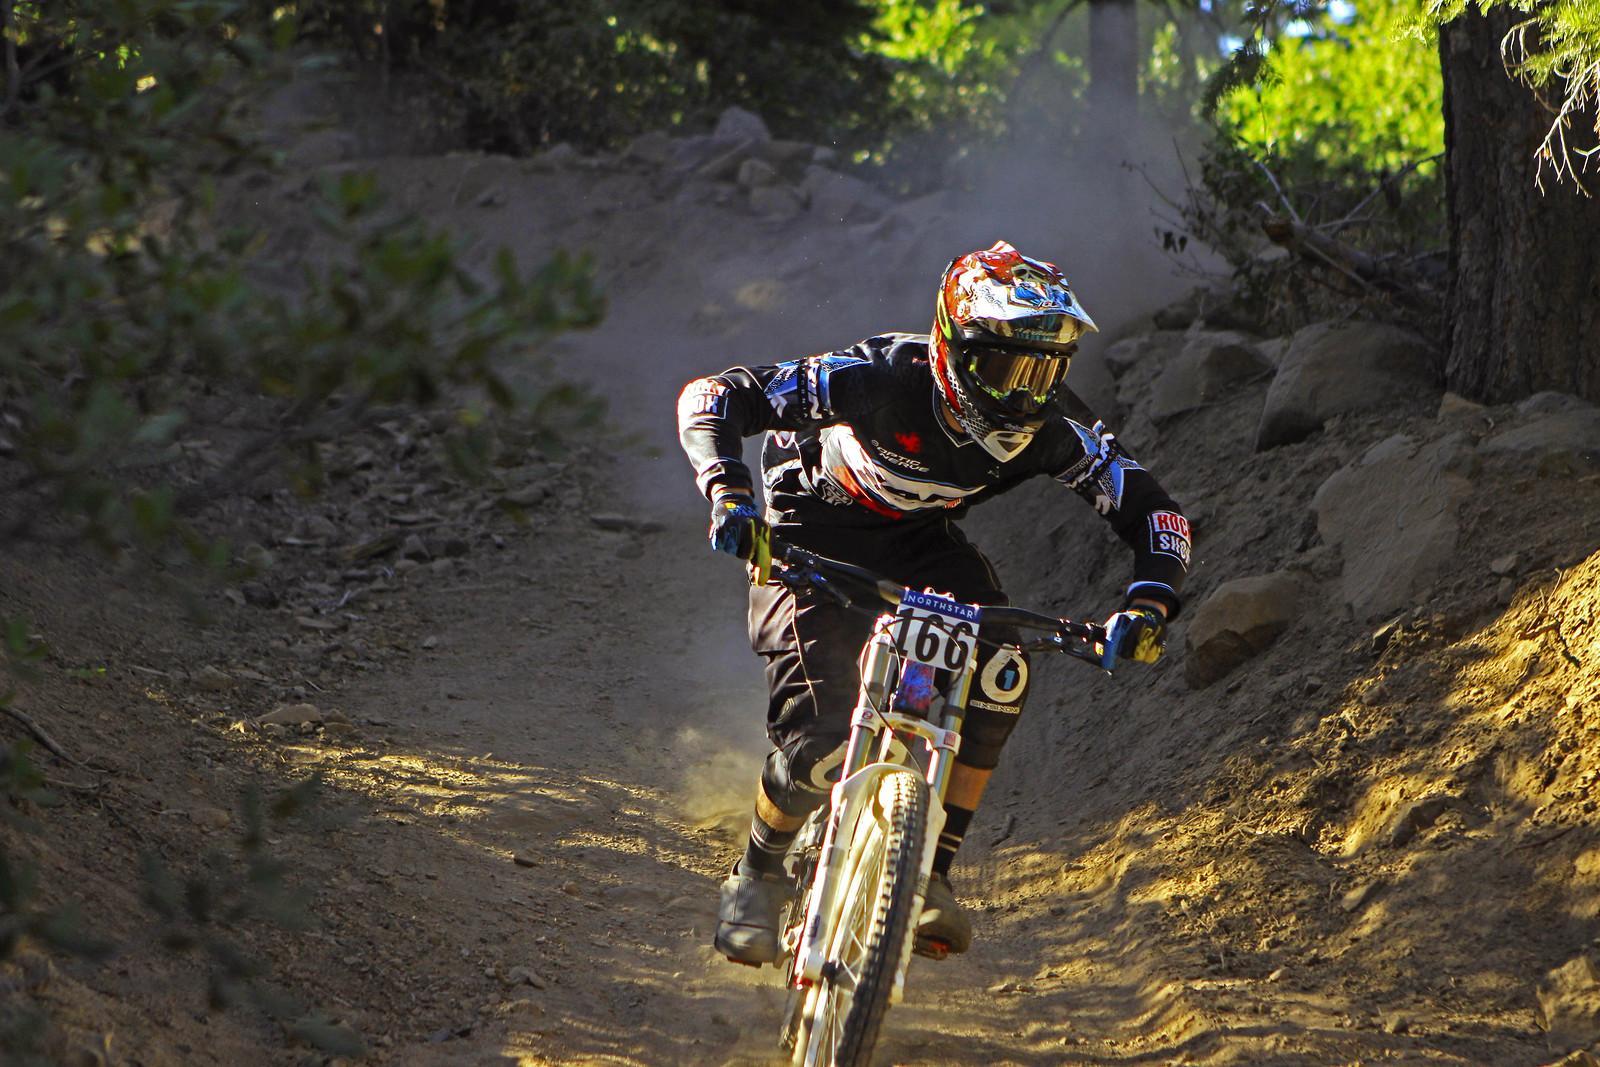 done8 1 - GnarHuck - Mountain Biking Pictures - Vital MTB